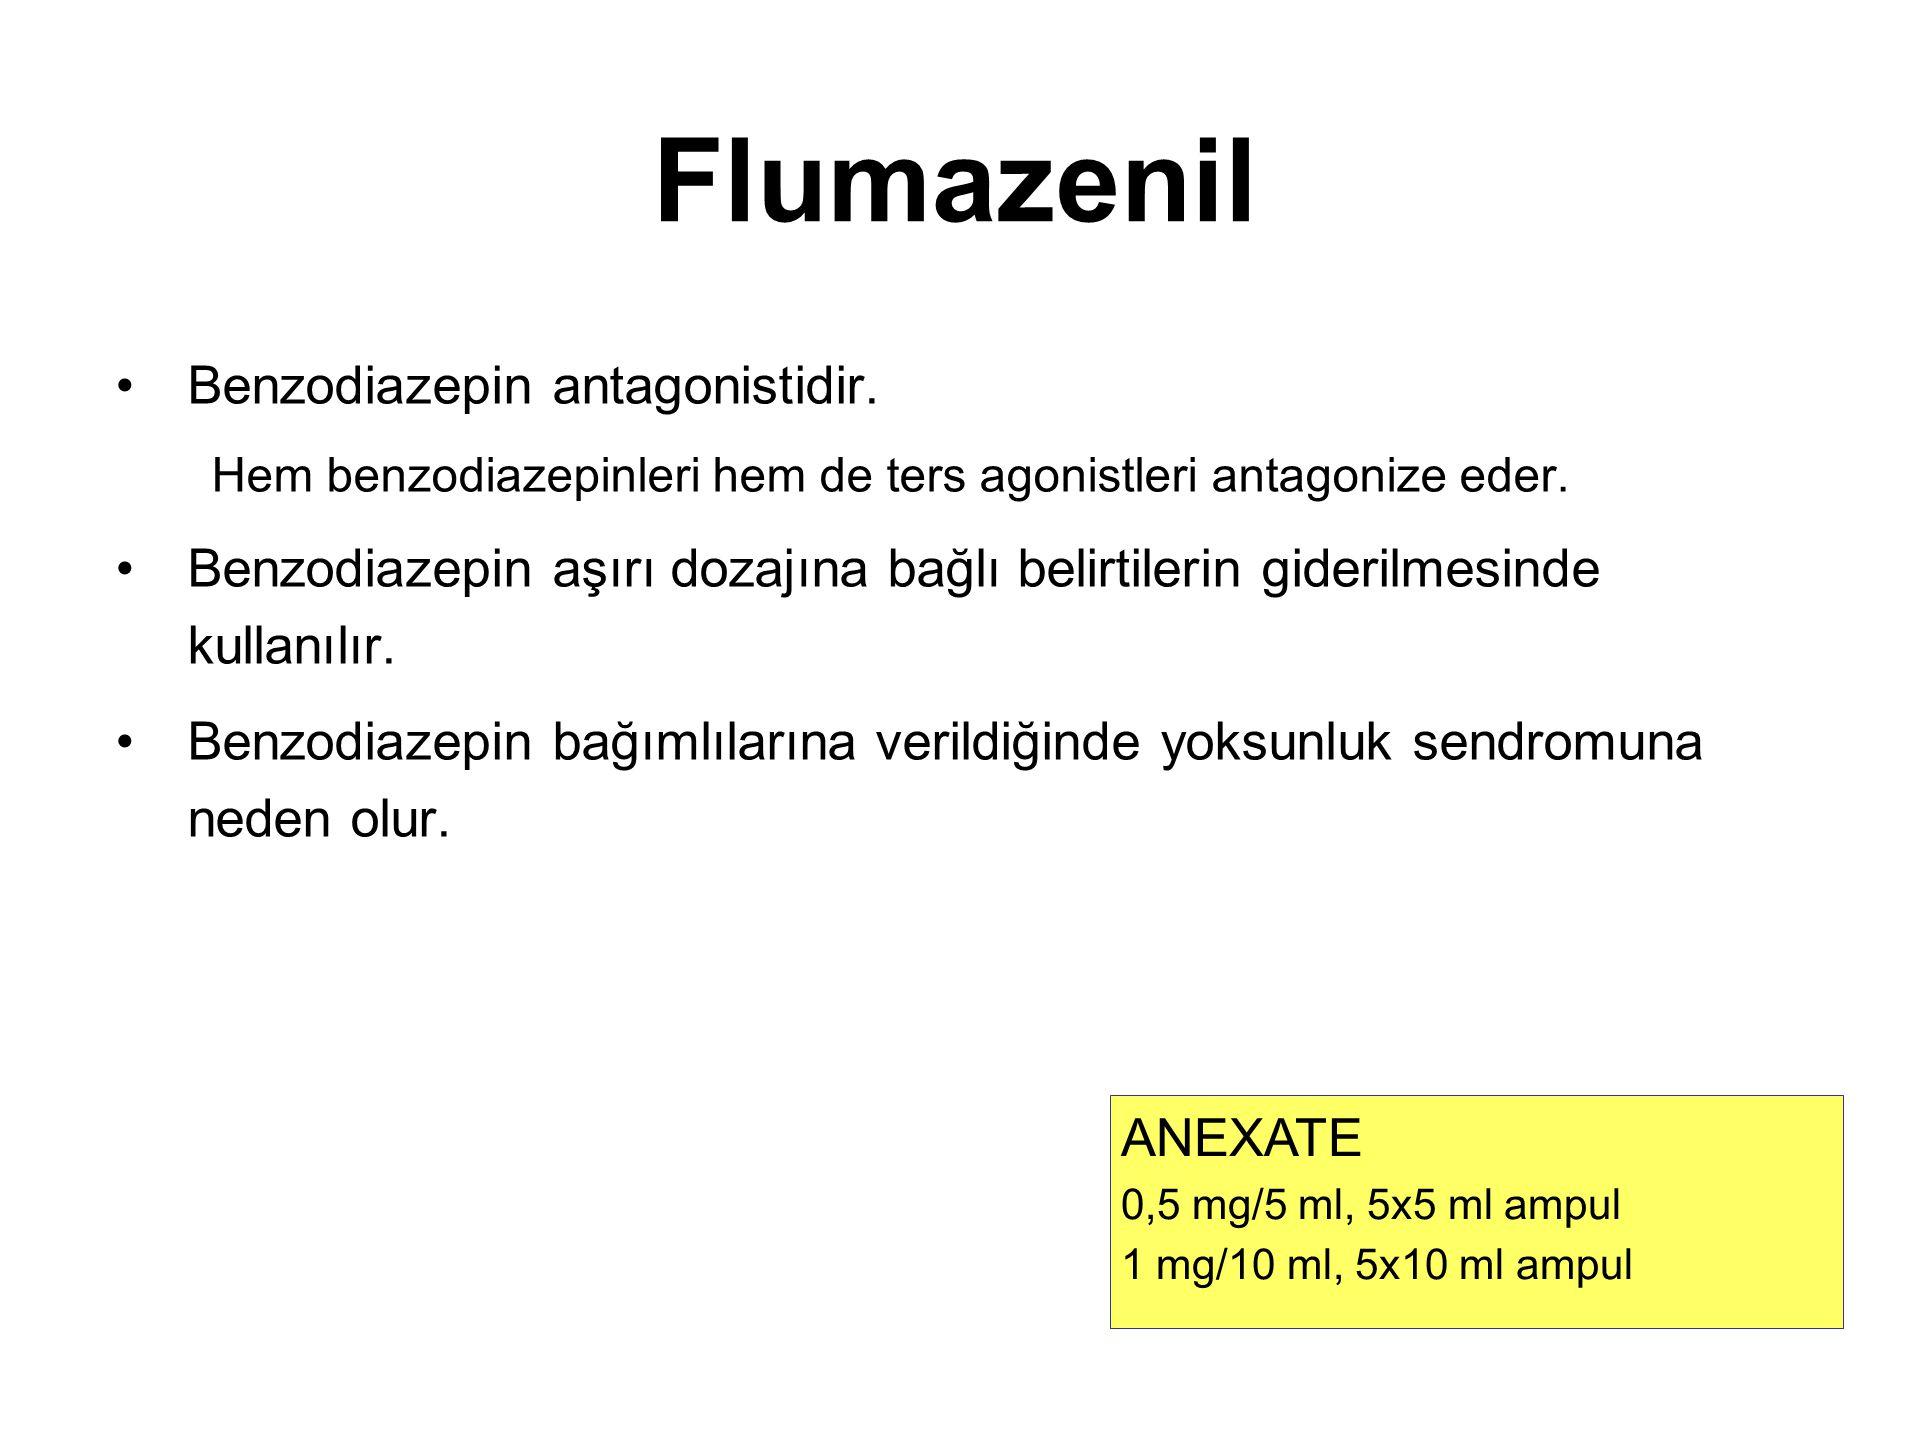 Spesiyaliteler Amitriptilin LAROXYL 10 mg, 30 draje 25 mg, 40 draje TRİPTİLİN 10 mg, 30 tablet 25 mg, 40 tablet Amitriptilin LAROXYL 10 mg, 30 draje 25 mg, 40 draje TRİPTİLİN 10 mg, 30 tablet 25 mg, 40 tablet Klomipramin ANAFRANİL 10 mg ve 25 mg, 30 draje 75 mg, 20 SR divitab 25 mg/ml, 2 ml'lik 10 ampul Klomipramin ANAFRANİL 10 mg ve 25 mg, 30 draje 75 mg, 20 SR divitab 25 mg/ml, 2 ml'lik 10 ampul İmipramin TOFRANİL 10 mg ve 25 mg, 50 draje İmipramin TOFRANİL 10 mg ve 25 mg, 50 draje Opipramol DEPRENİL 50 mg, 30 tablet İNSİDON 50 mg, 30 draje İNSOMİN 50 mg, 30 draje İNZETON 50 mg, 30 tablet OPRİDON 50 mg, 30 tablet Opipramol DEPRENİL 50 mg, 30 tablet İNSİDON 50 mg, 30 draje İNSOMİN 50 mg, 30 draje İNZETON 50 mg, 30 tablet OPRİDON 50 mg, 30 tablet Mianserin TOLVON 10 mg, 30 tablet 30 mg, 14 tablet Mianserin TOLVON 10 mg, 30 tablet 30 mg, 14 tablet Maprotilin LUDİOMİL 25 mg, 30 tablet 75 mg, 14 tablet 25 mg, 10 ampul MAPROTİL 25 mg, 30 tablet 75 mg, 14 tablet Maprotilin LUDİOMİL 25 mg, 30 tablet 75 mg, 14 tablet 25 mg, 10 ampul MAPROTİL 25 mg, 30 tablet 75 mg, 14 tablet Trazodon DESYREL 50 mg ve 100 mg, 30 tablet Trazodon DESYREL 50 mg ve 100 mg, 30 tablet